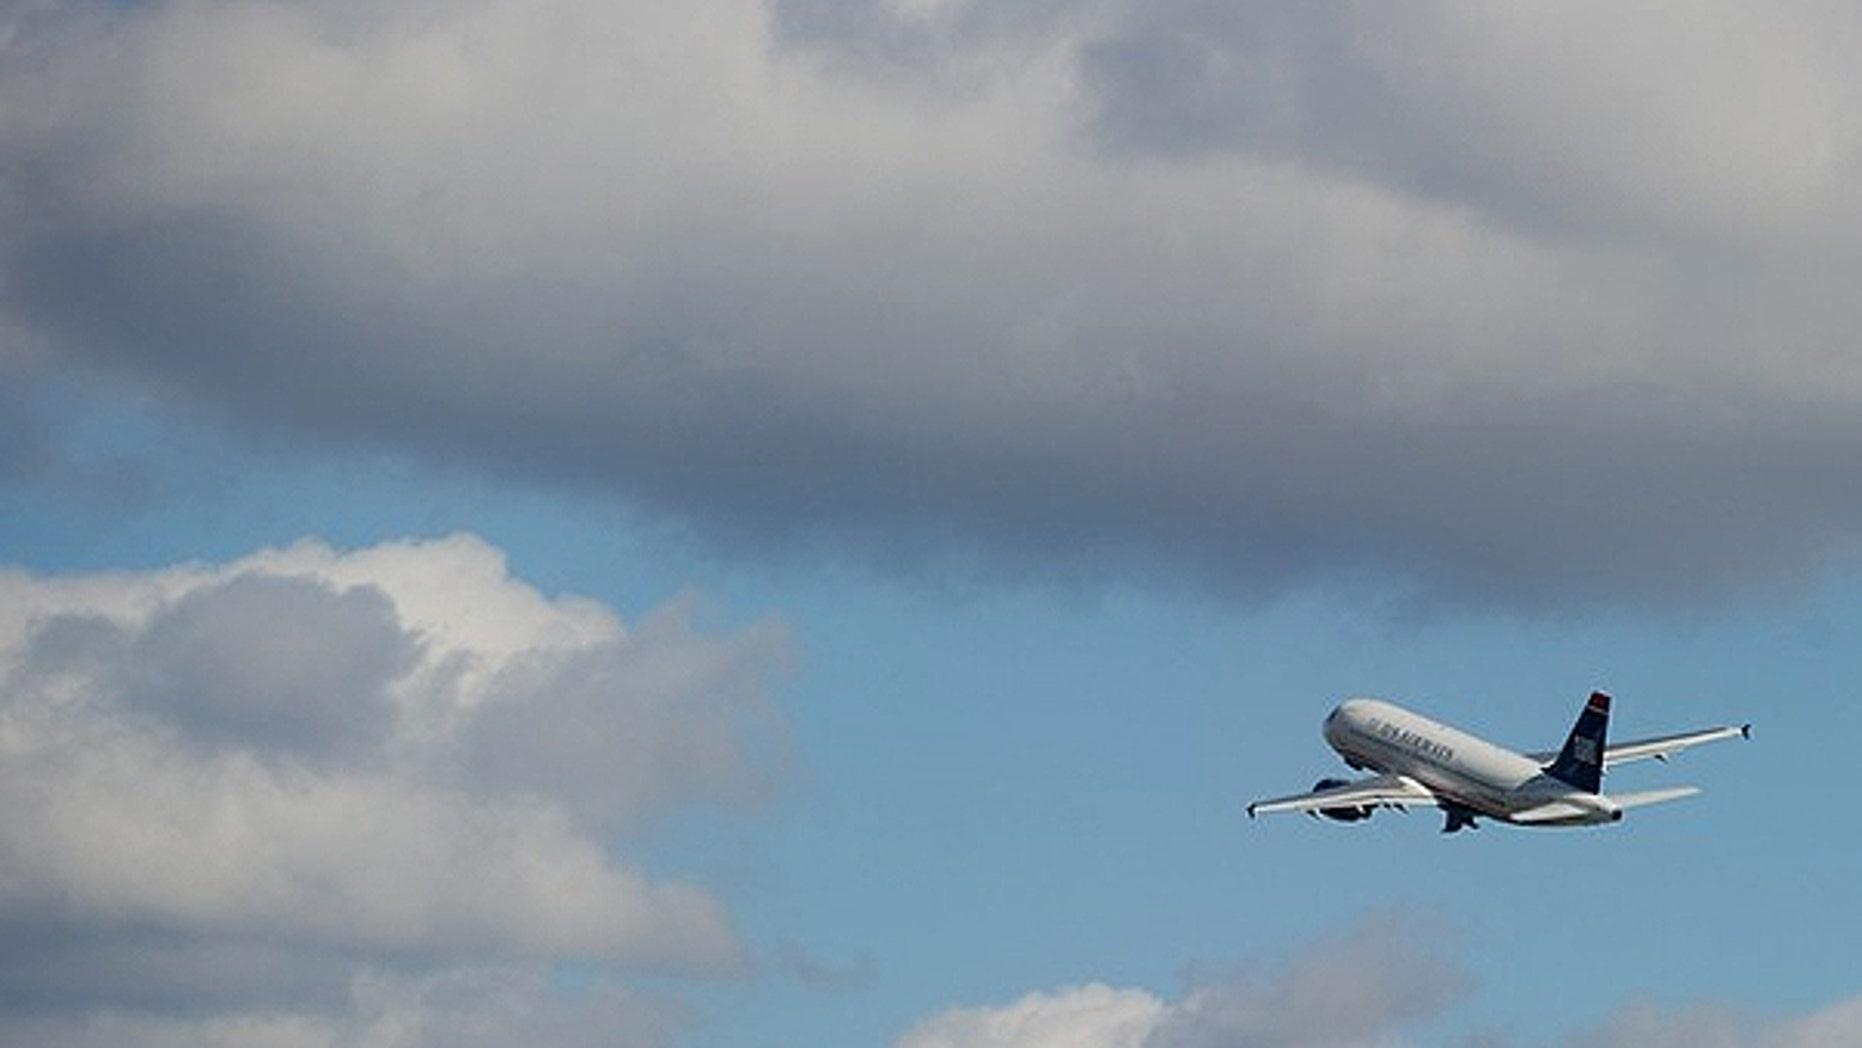 Nov. 6: A US Airways Airbus A319 airplane takes off from Ronald Reagan Washington National Airport in Arlington, Virginia.